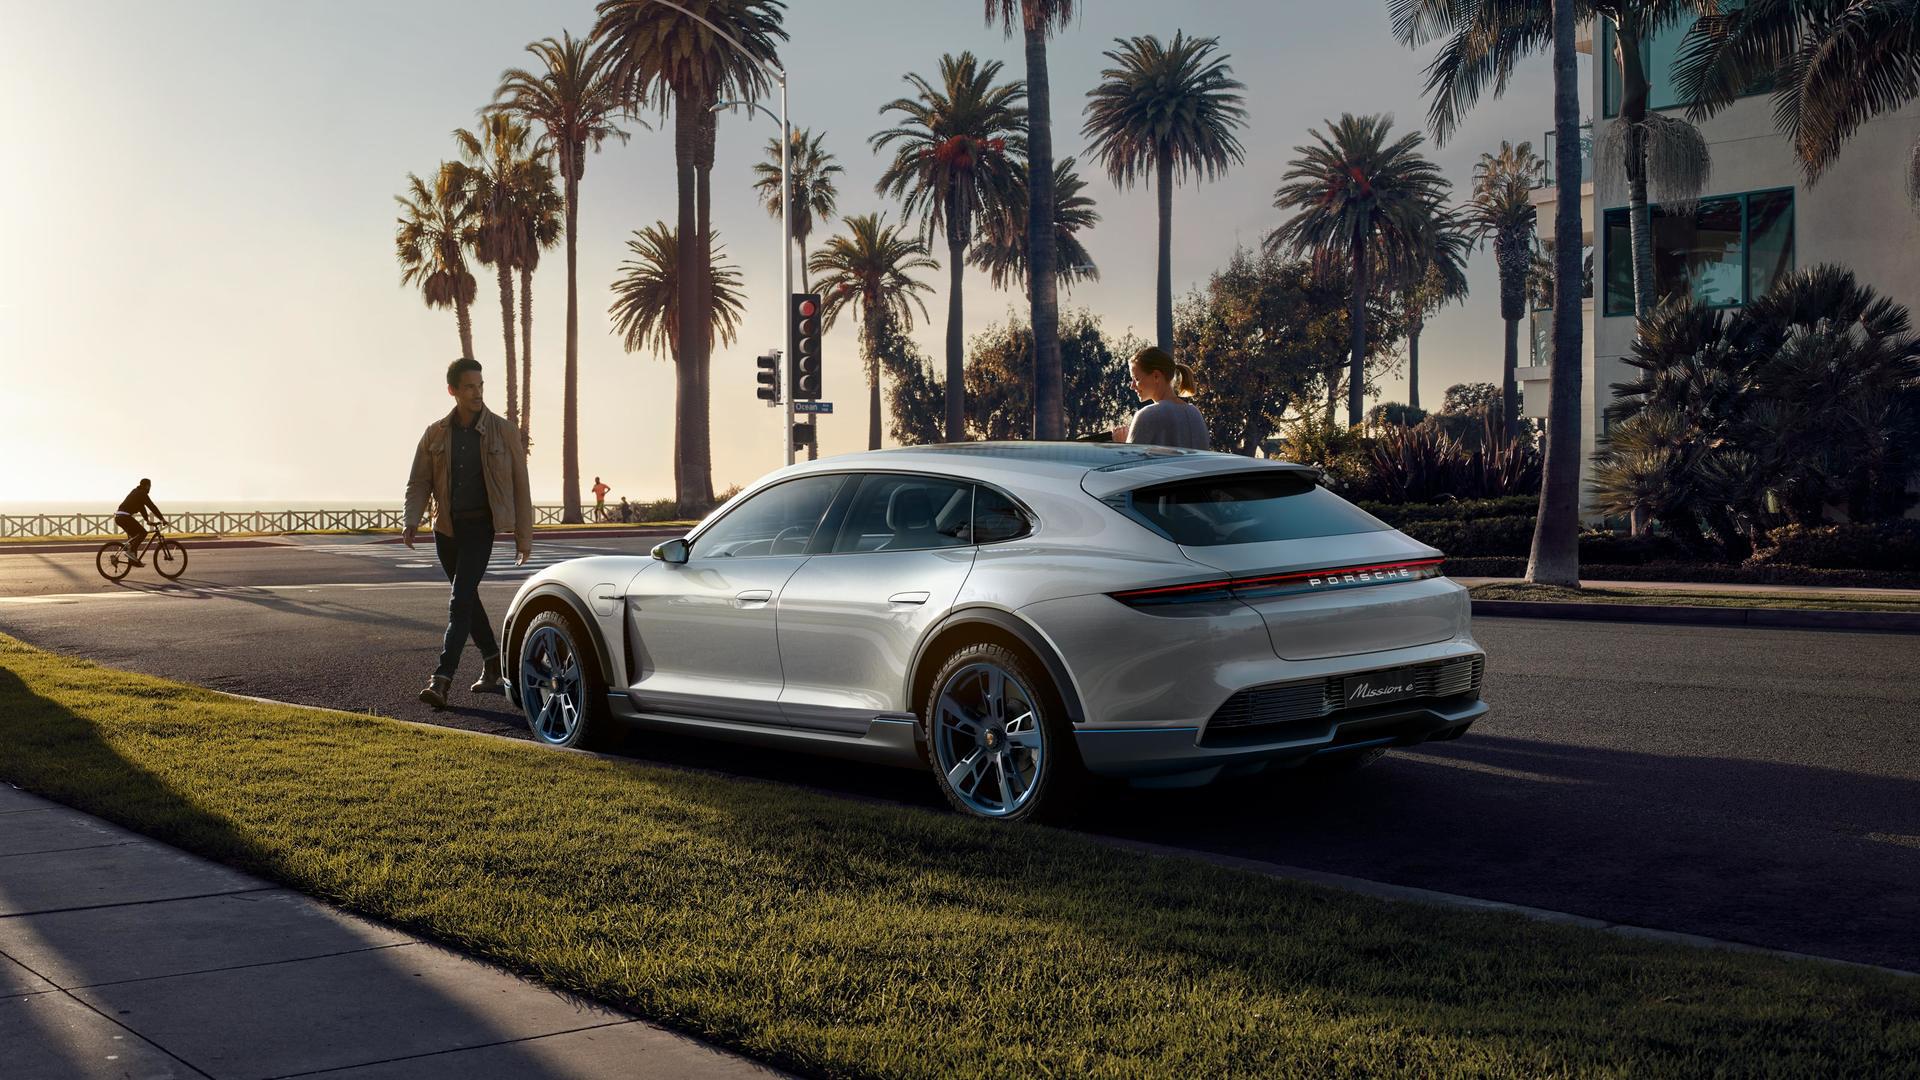 2018 Geneva Motor Show: Porsche Mission E Cross Turismo